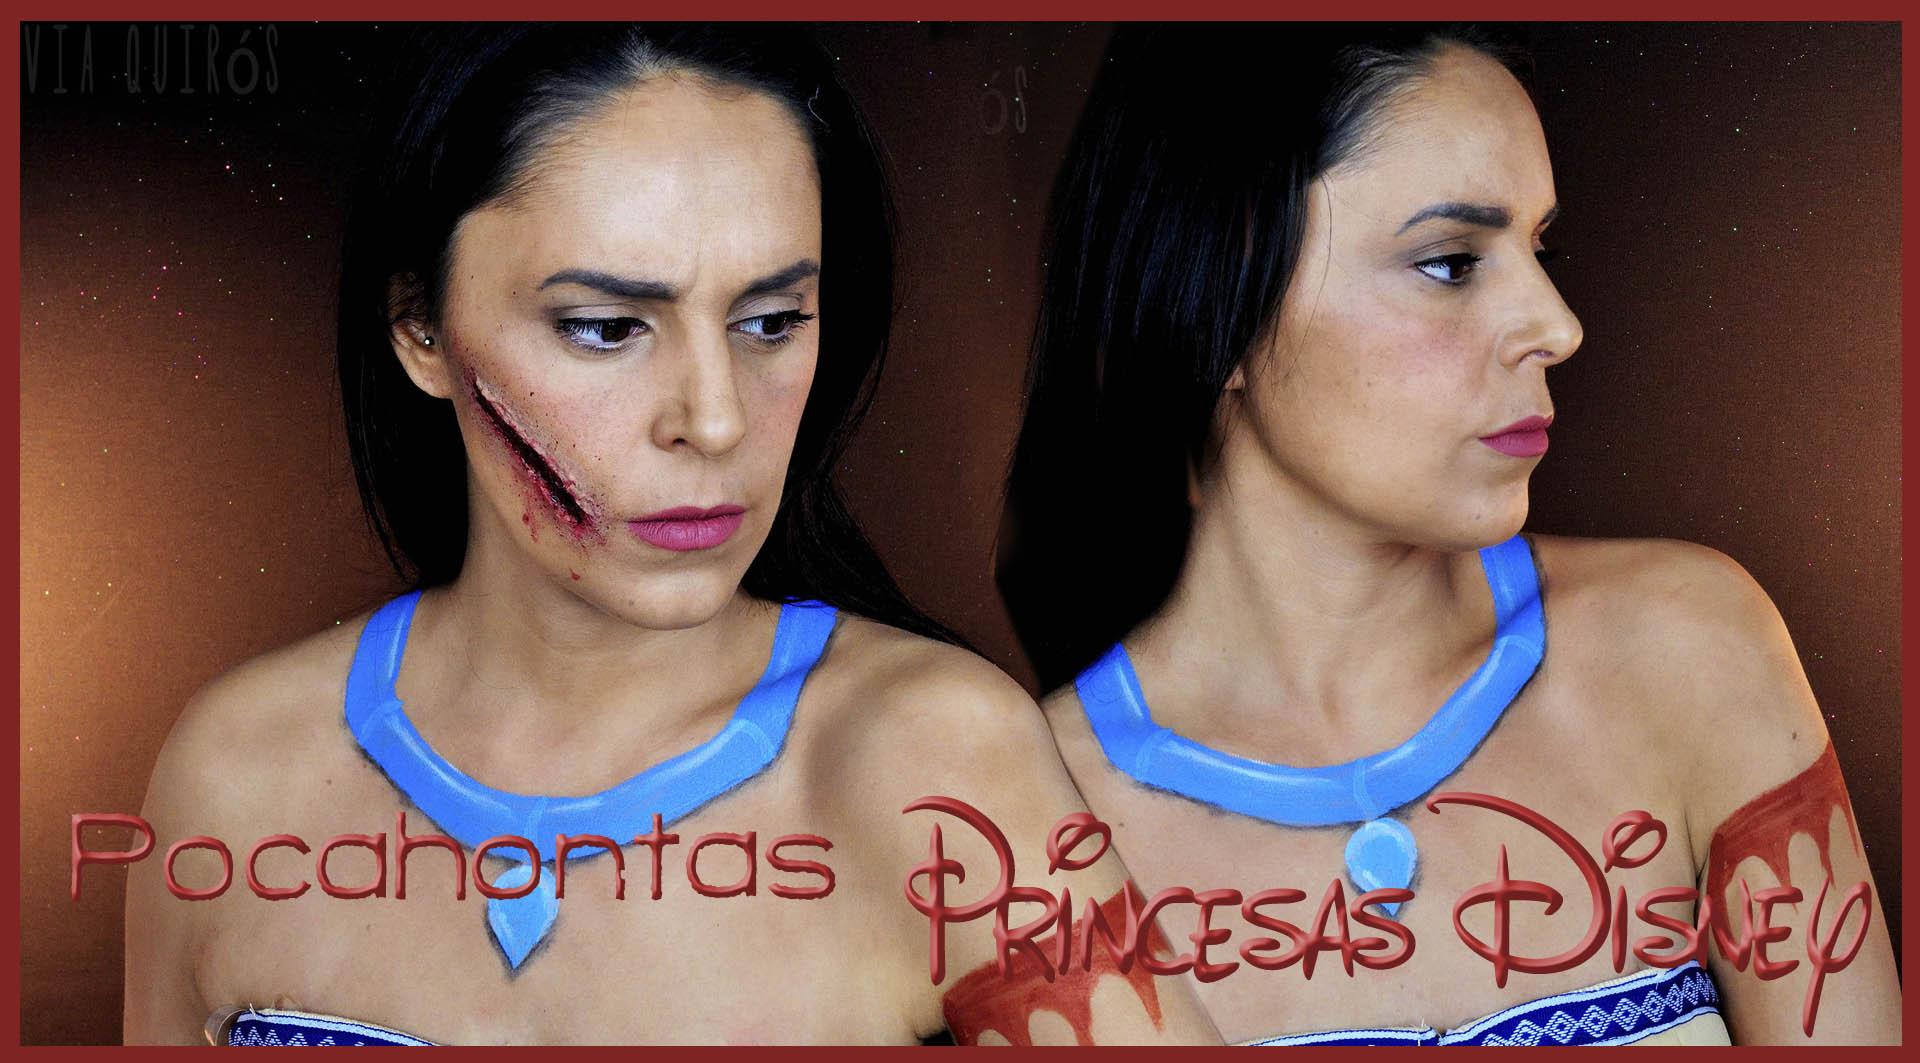 Pocahontas con rasgado de bala efectos especiales